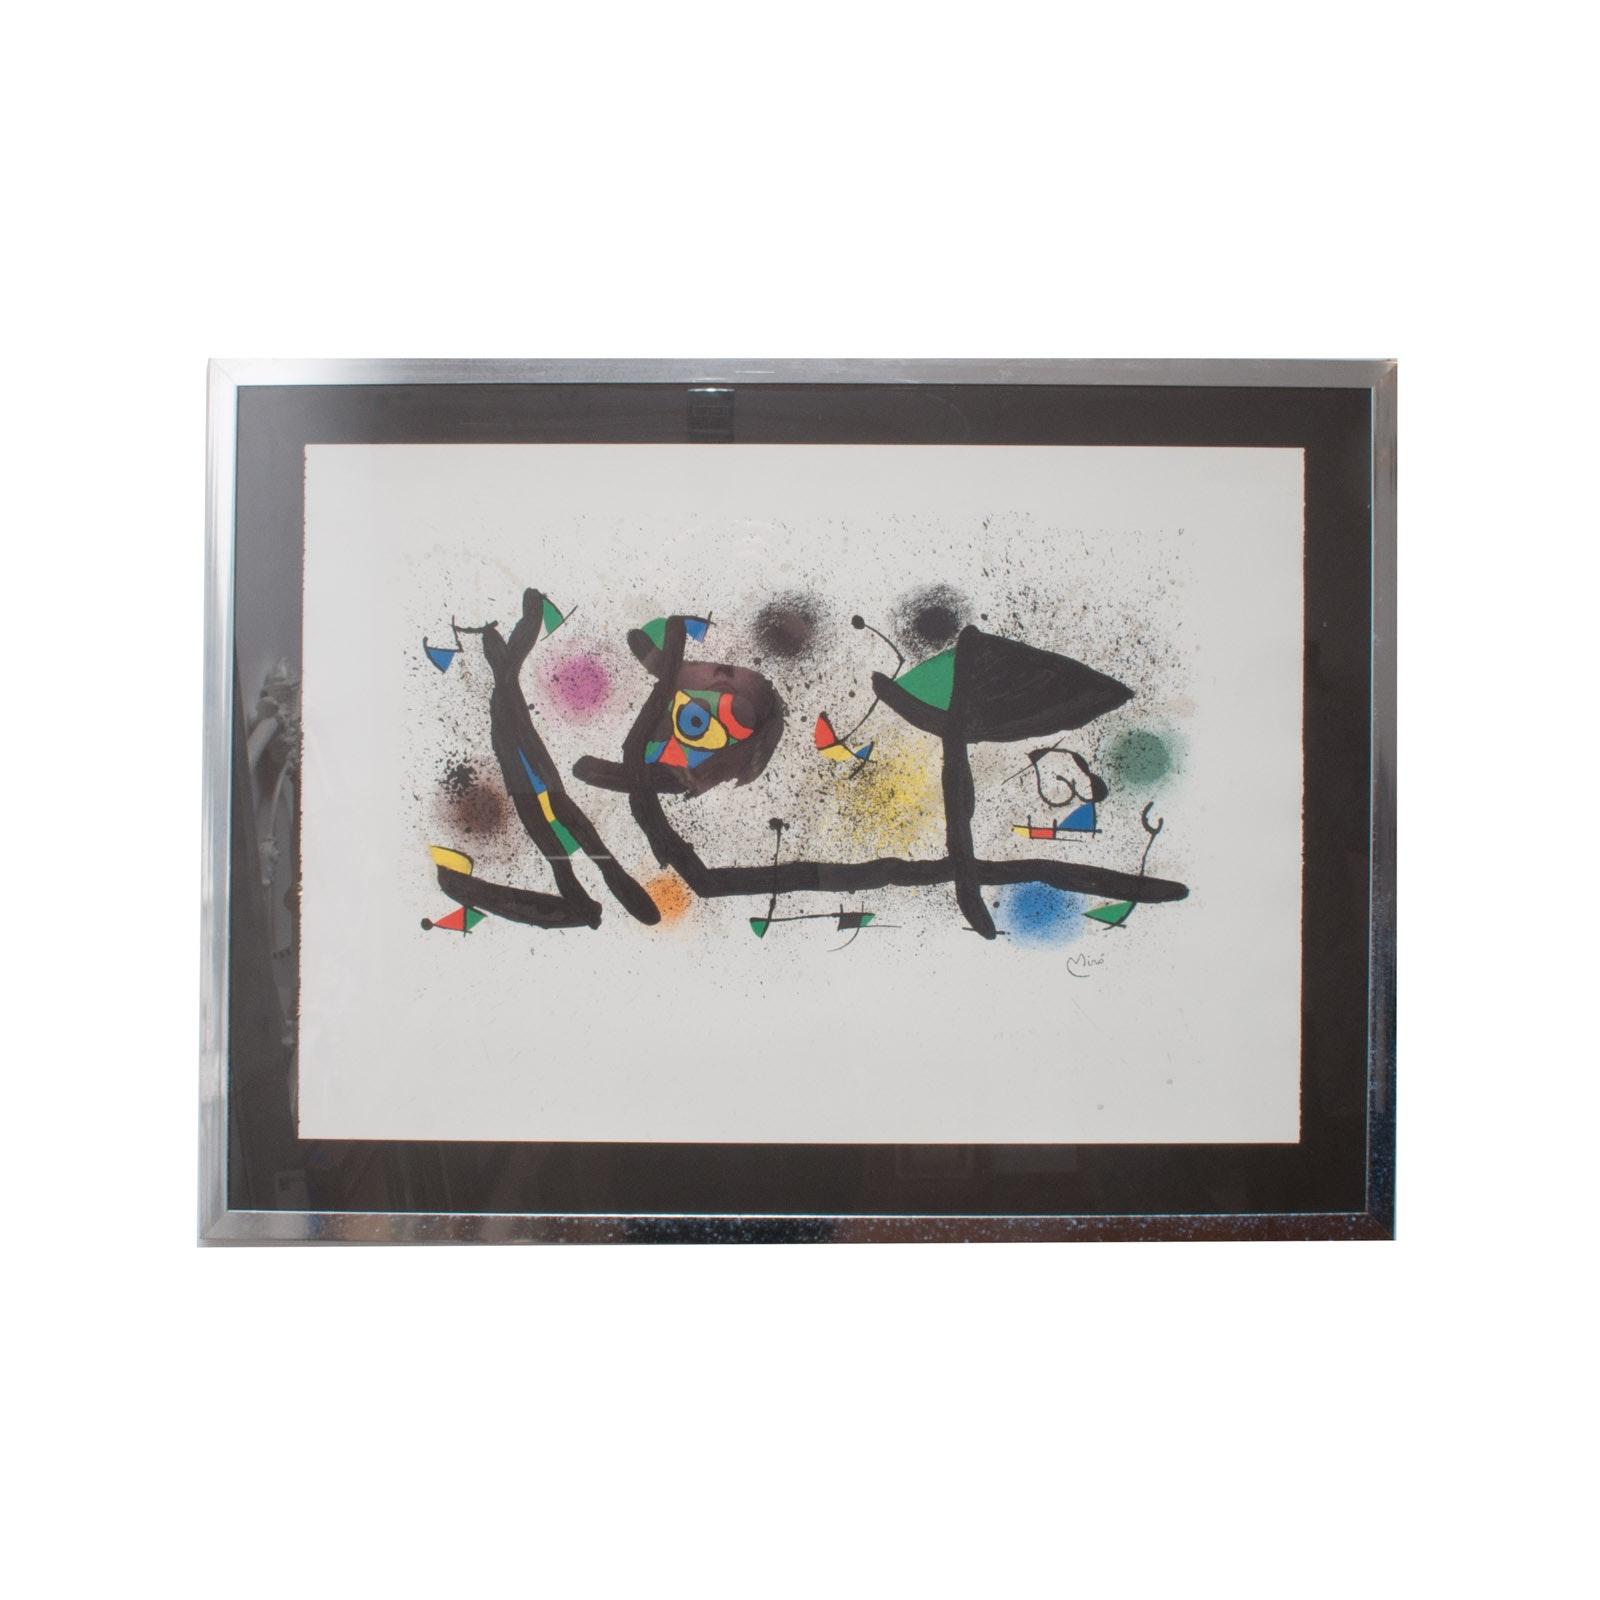 Joan Miró i Ferrà Lithograph Print on Laid Paper